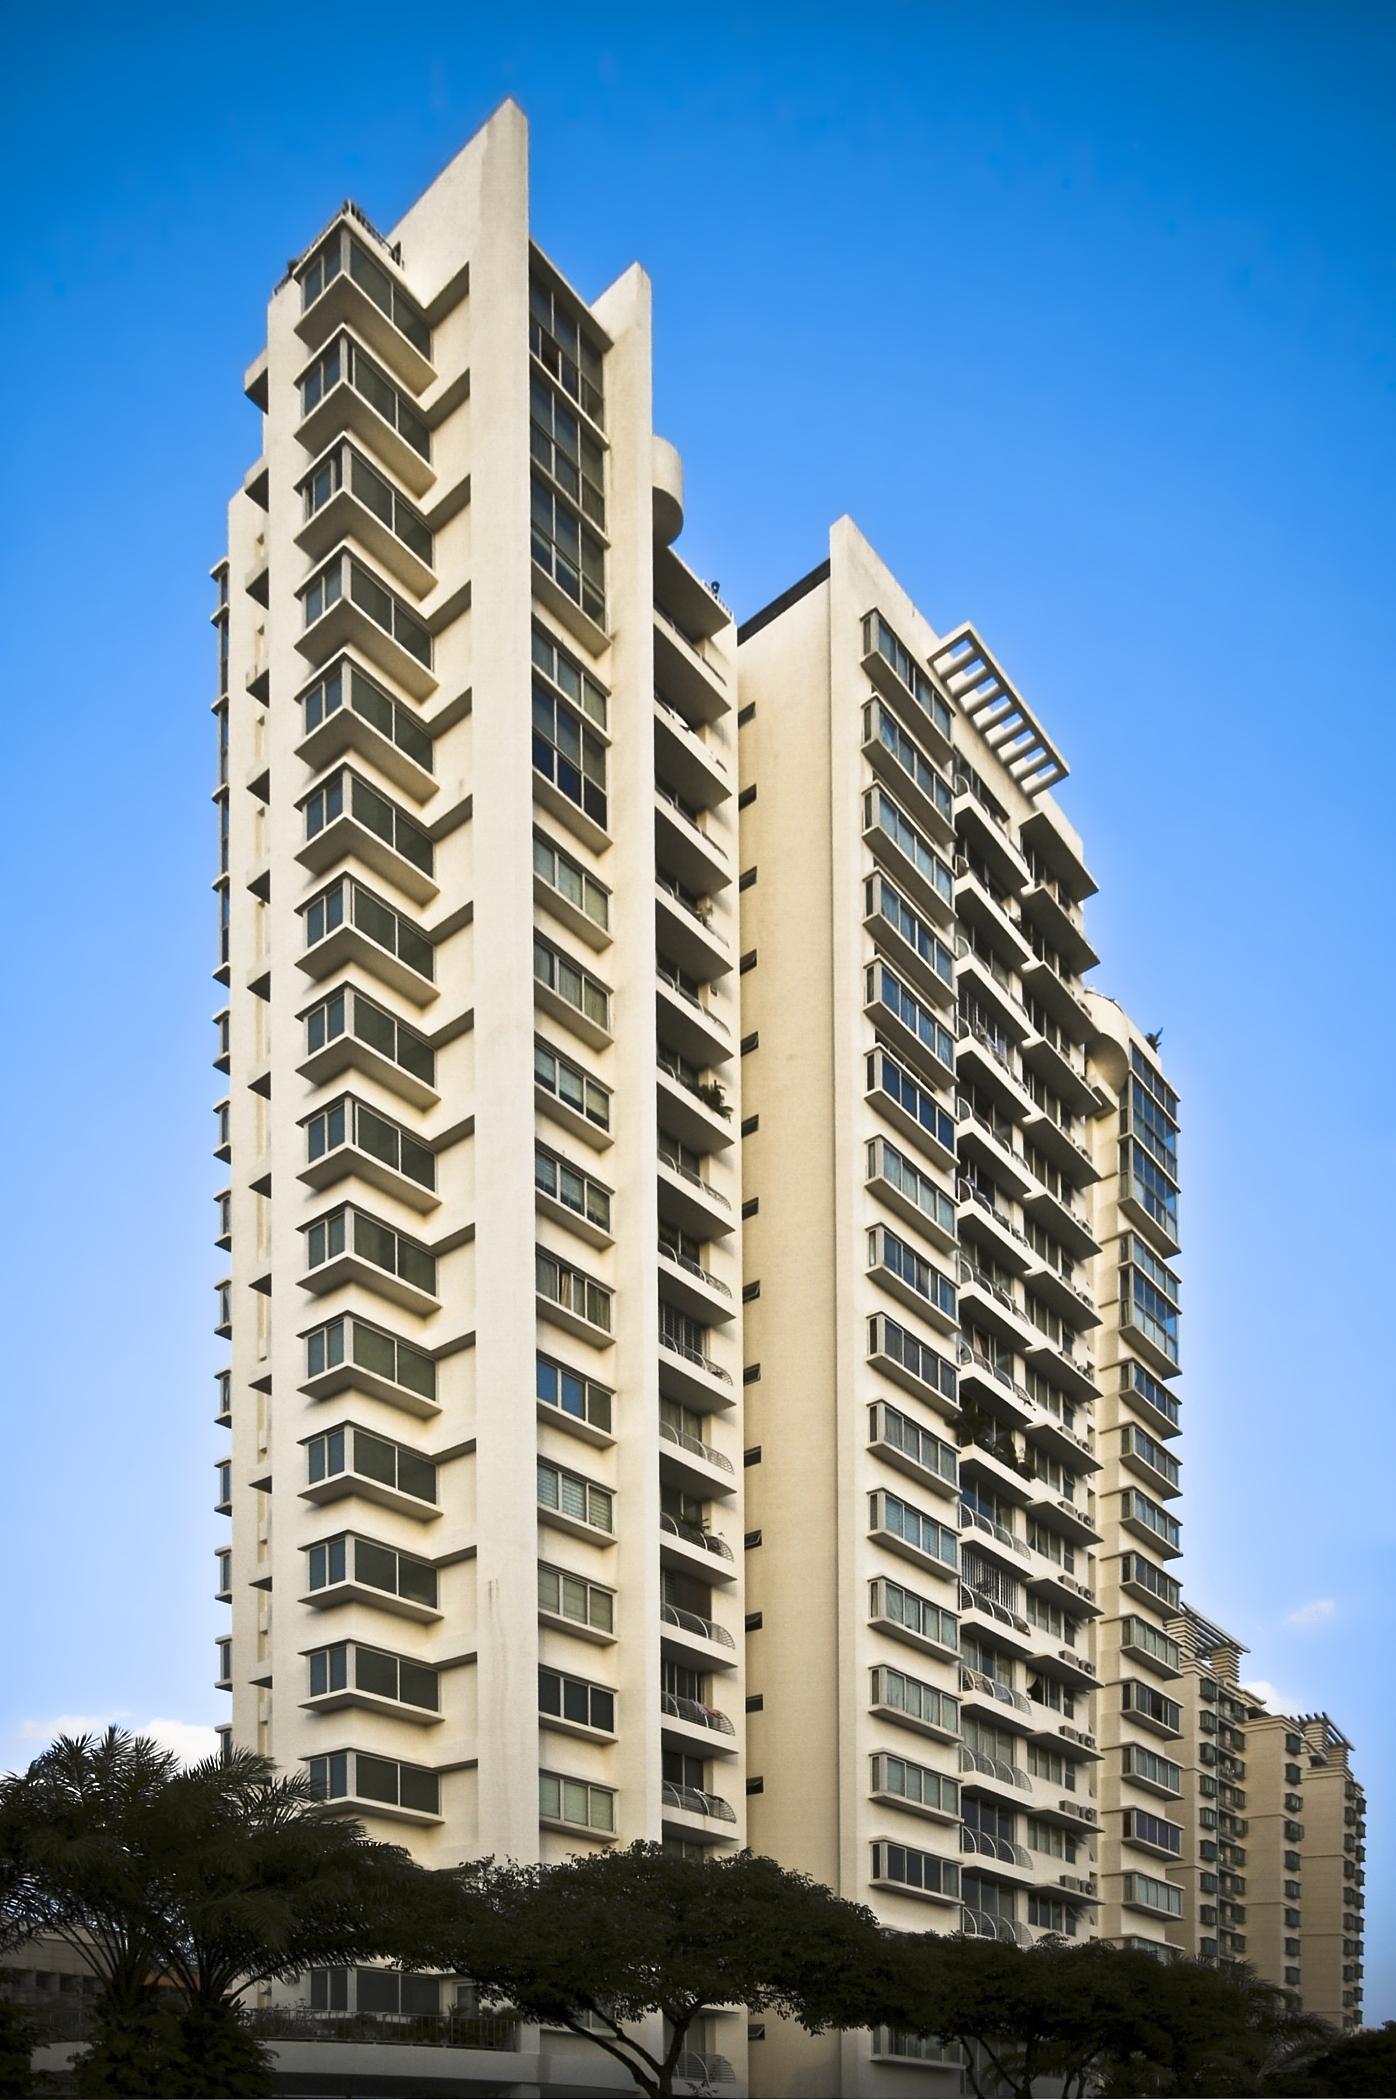 FileGolden Heights Condominium Singaporejpg Wikimedia